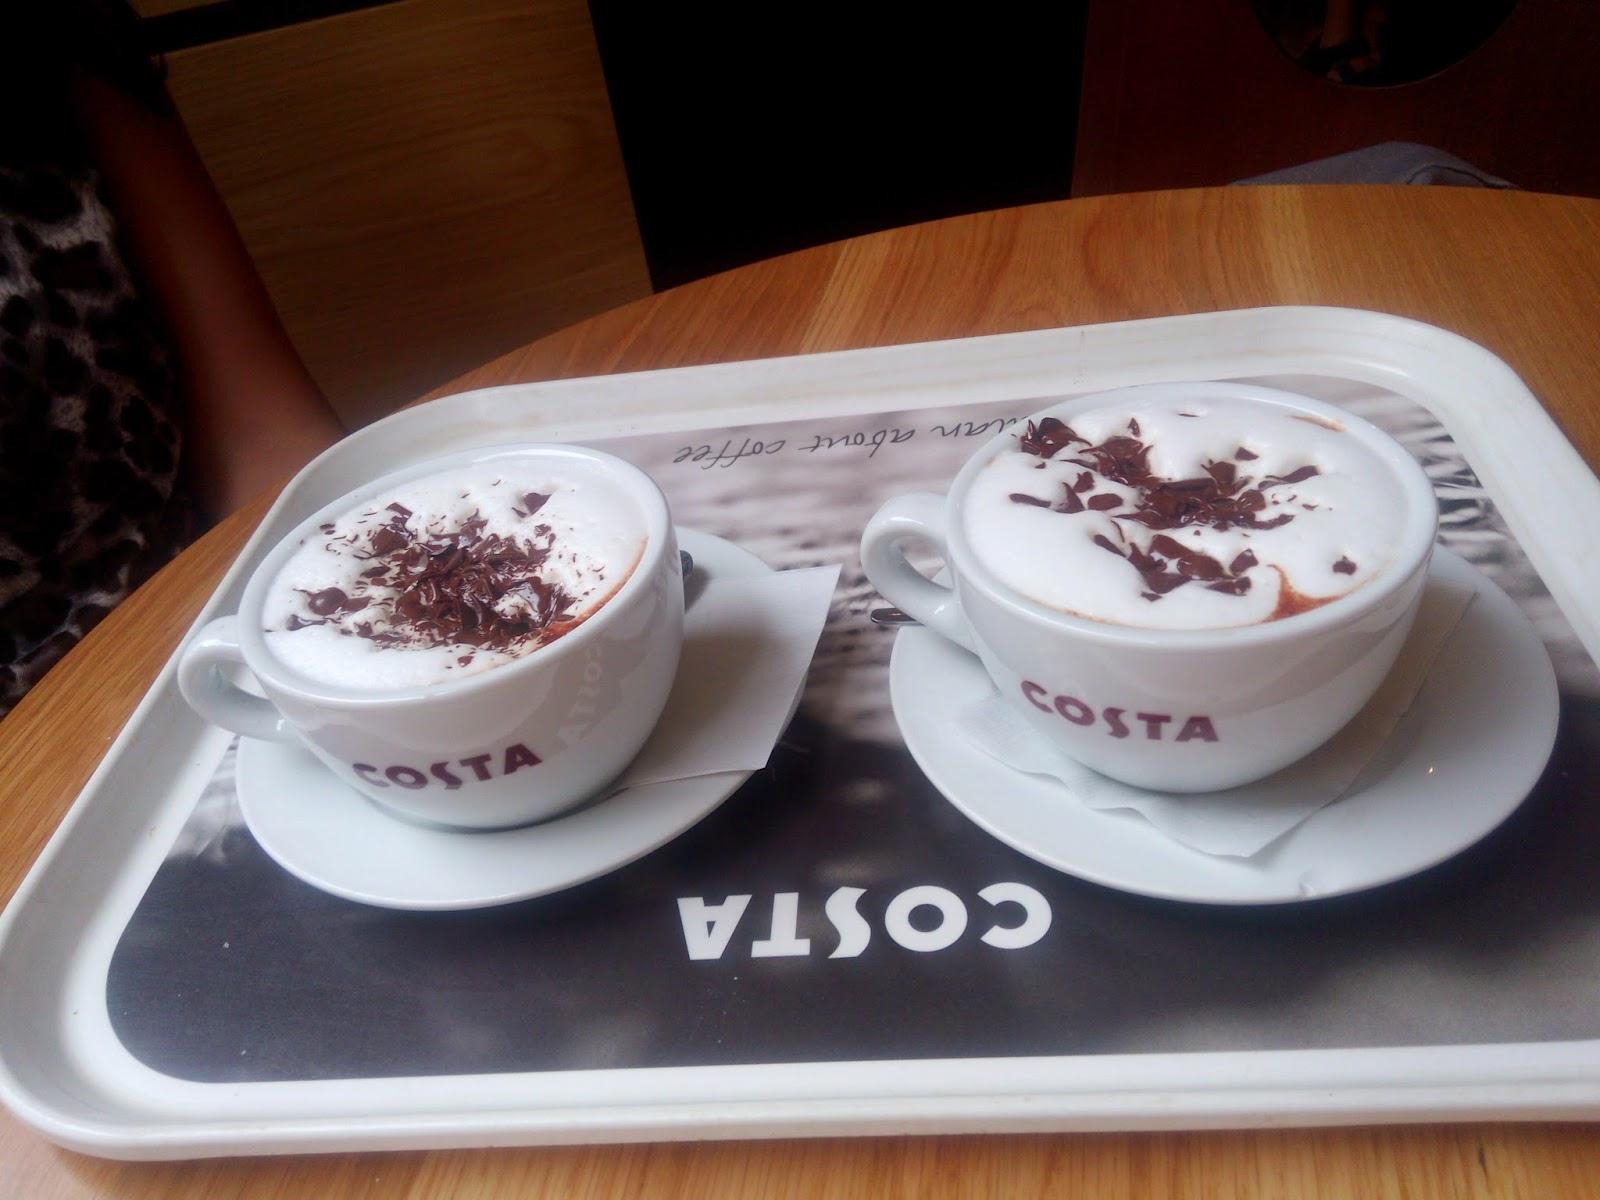 bares_malaga_costa_coffee_malaga